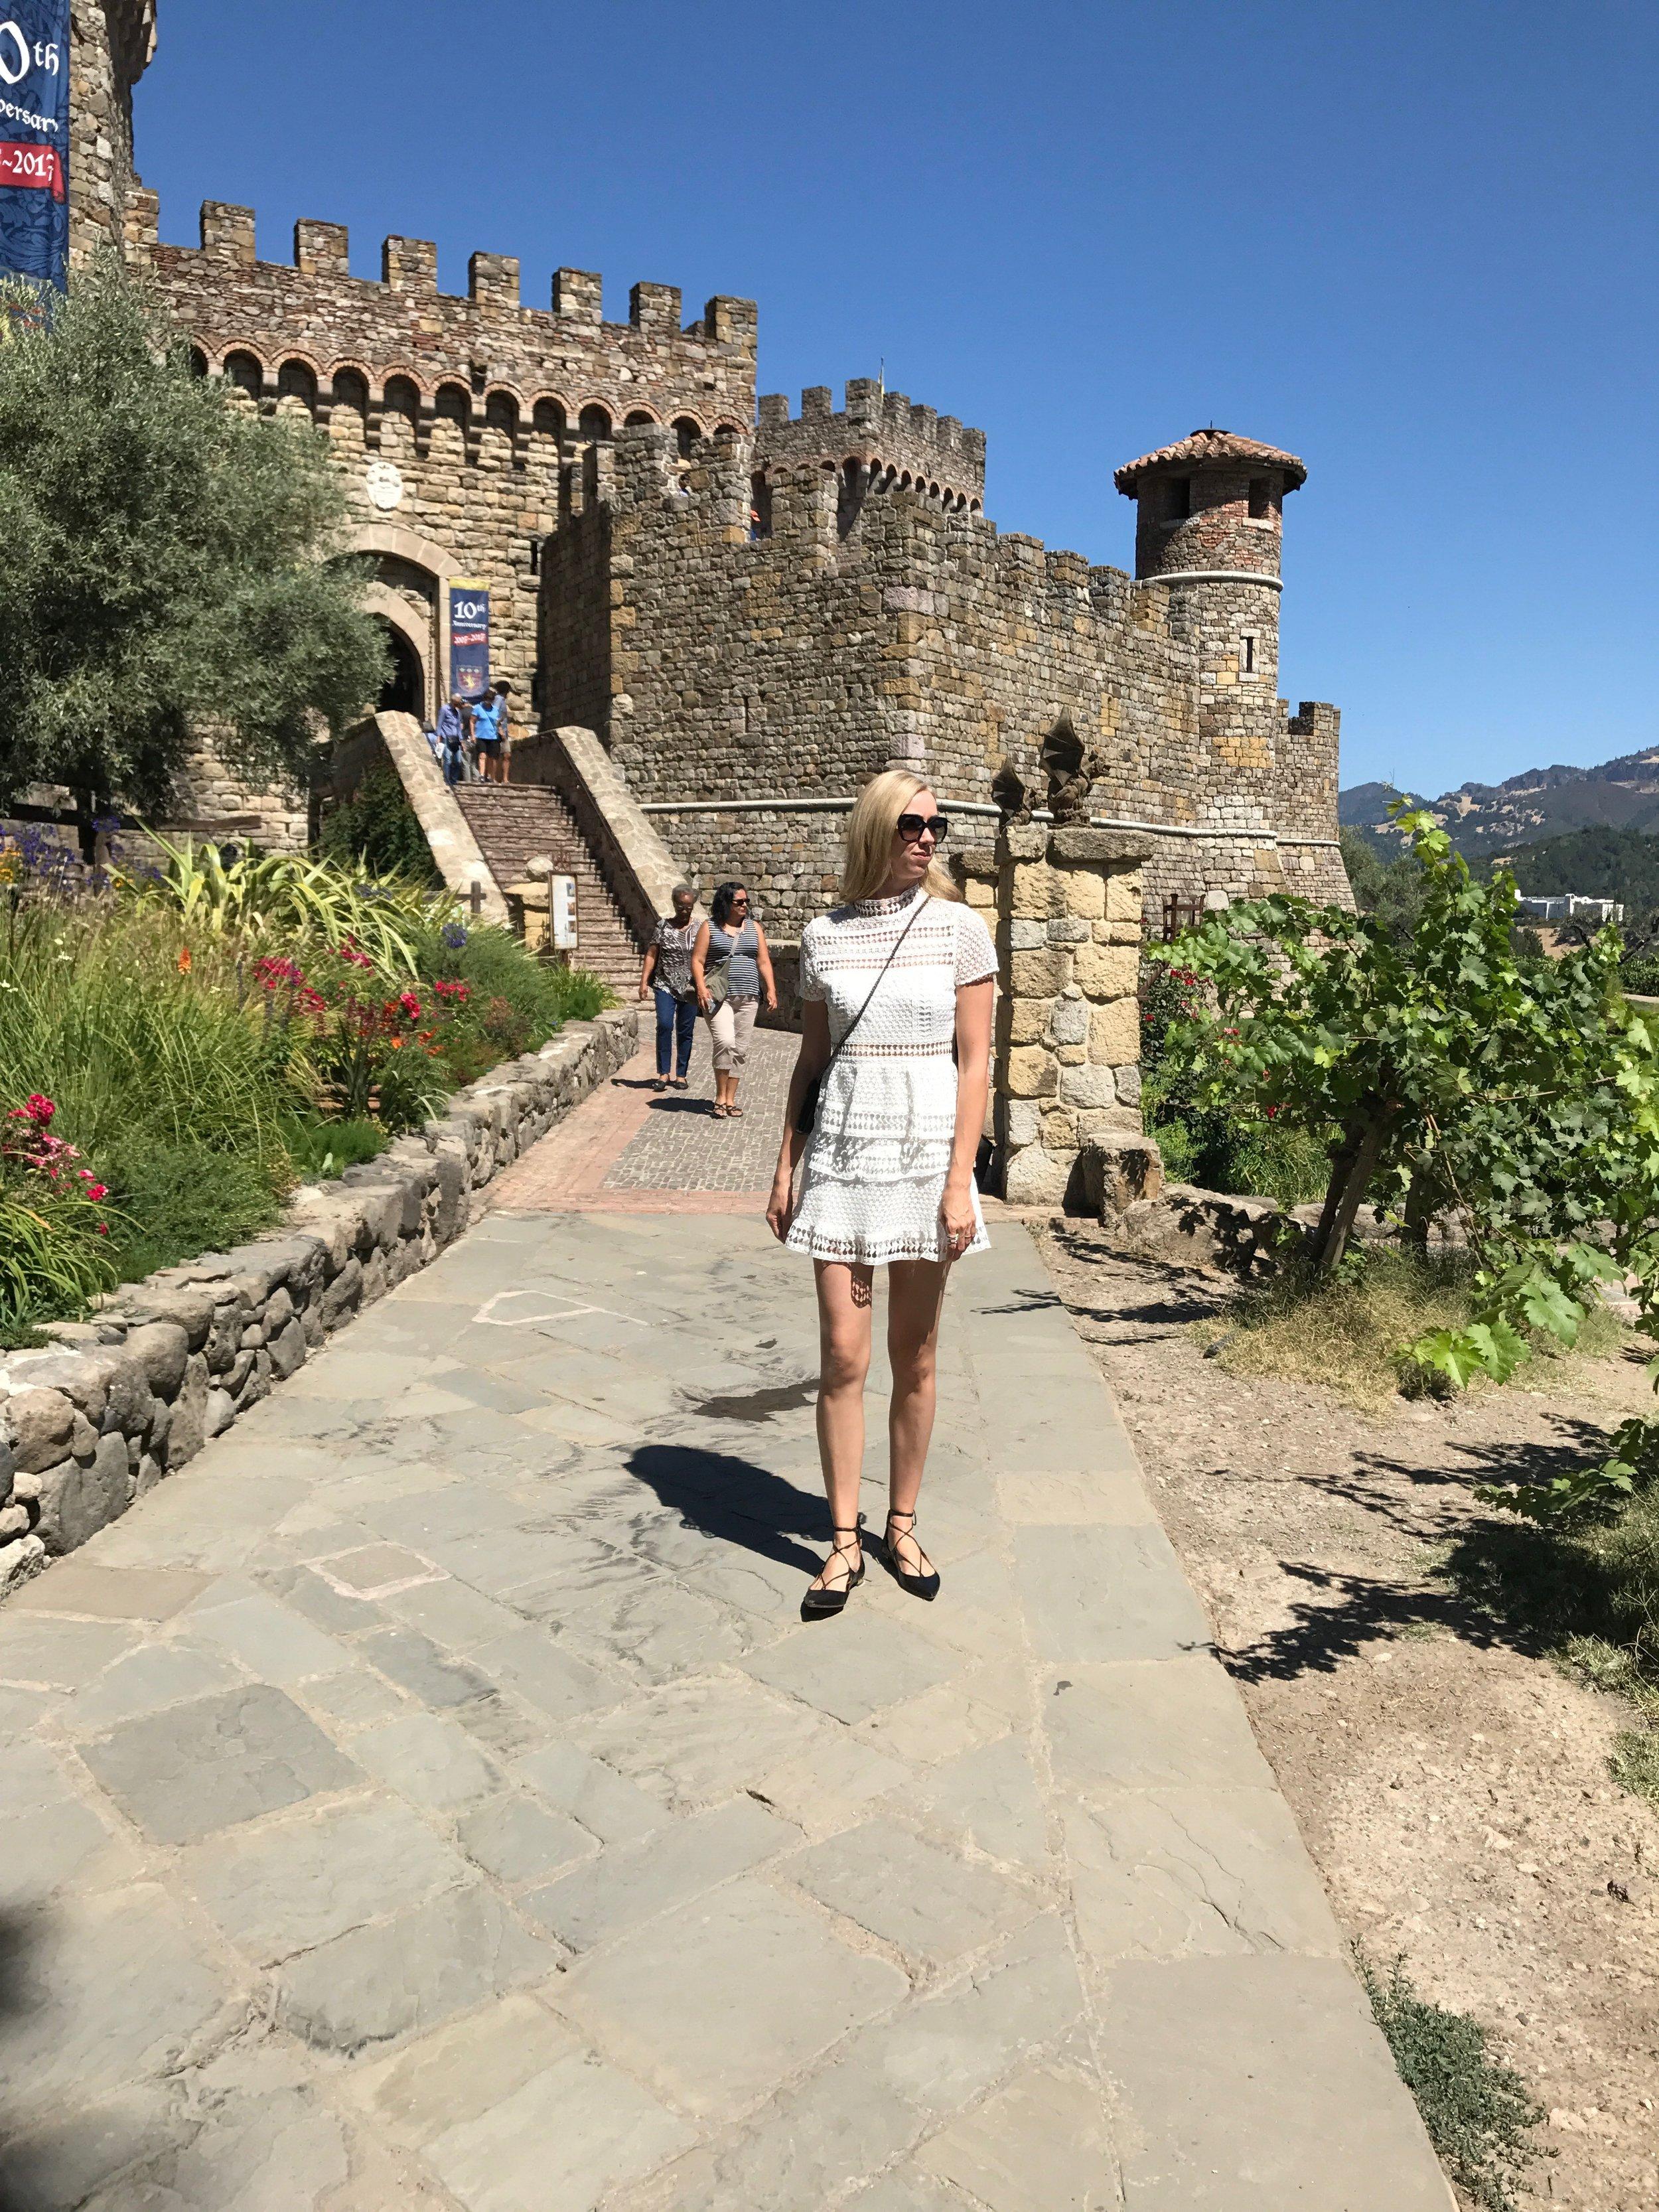 Castello-di-Amorosa-napa-valley-rachel-with-love-and-style-blog-1.jpg